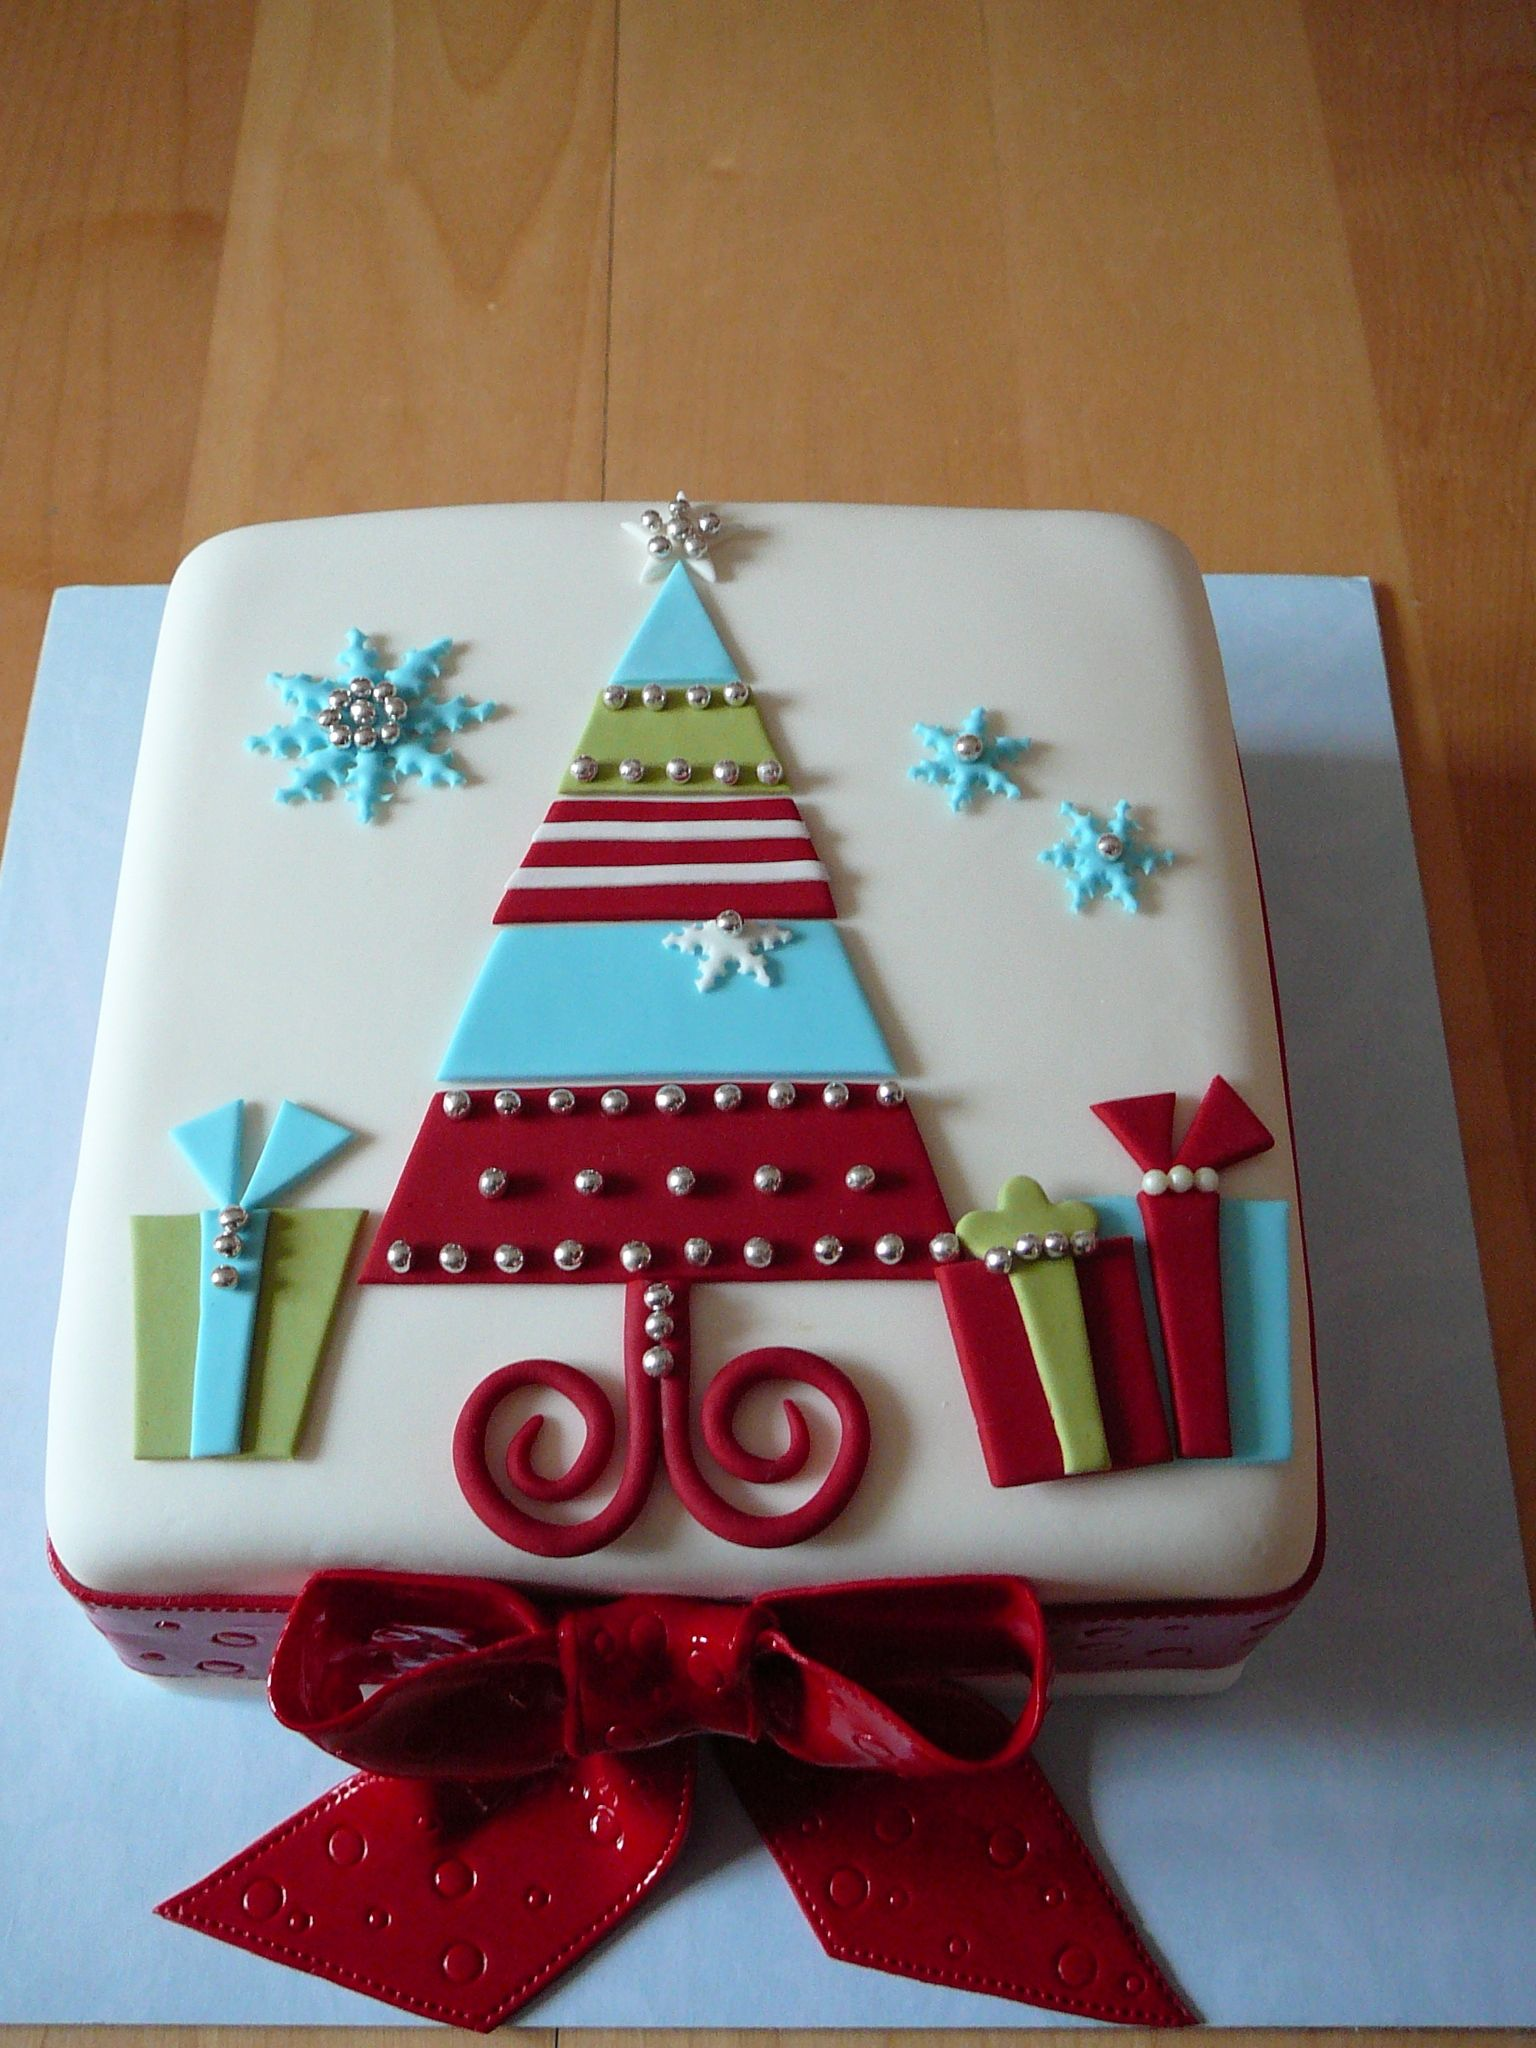 Christmas Tree | Christmas cake decorations, Christmas cake designs, Christmas  cake